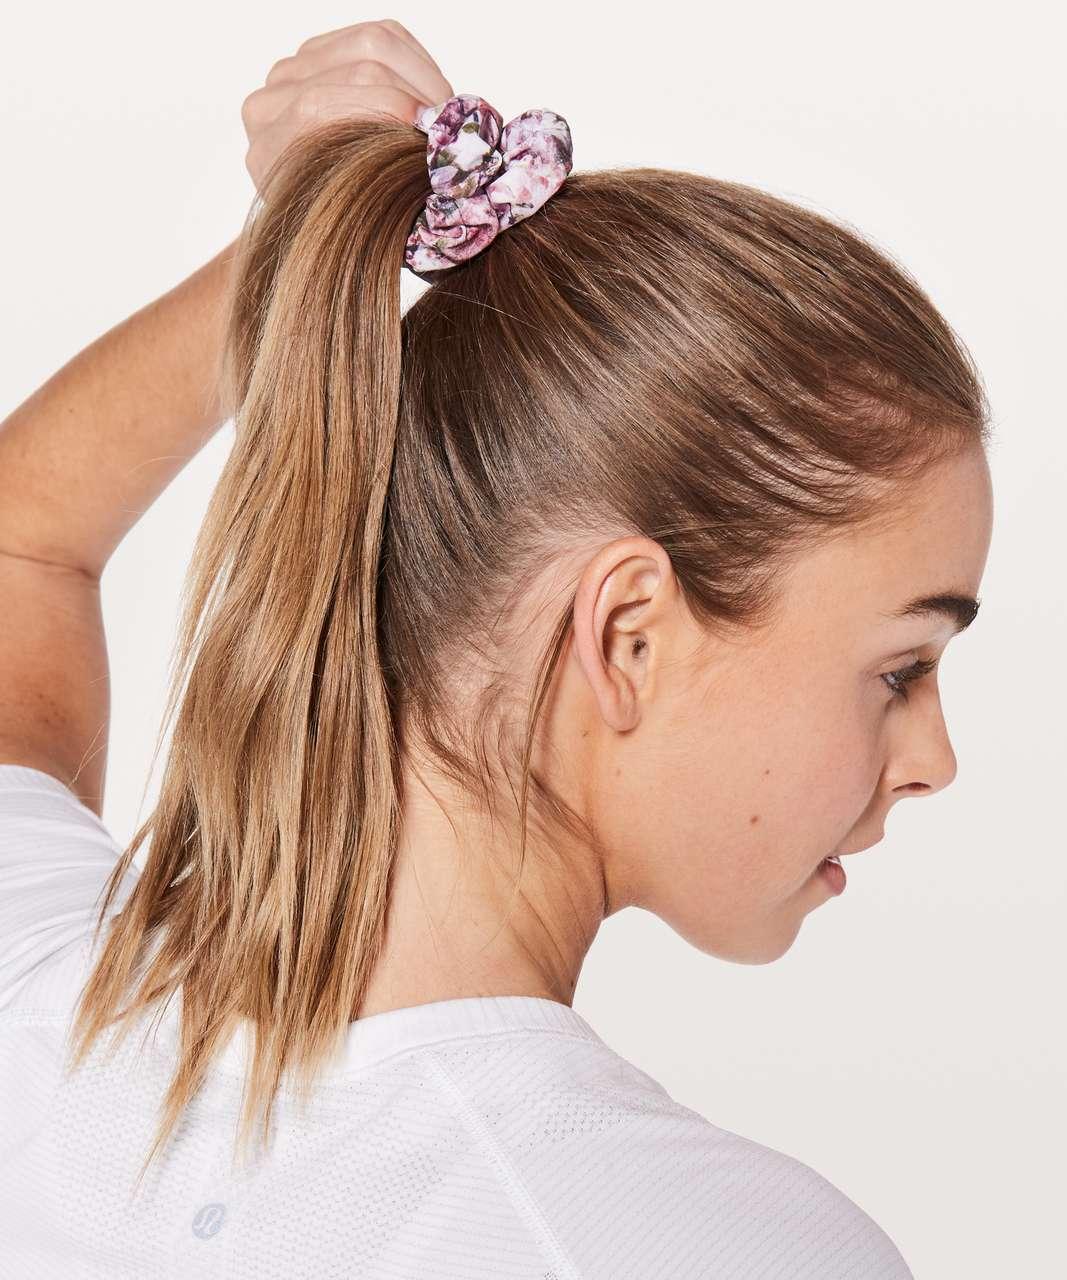 Lululemon Uplifting Scrunchie - Blossom Spritz Multi